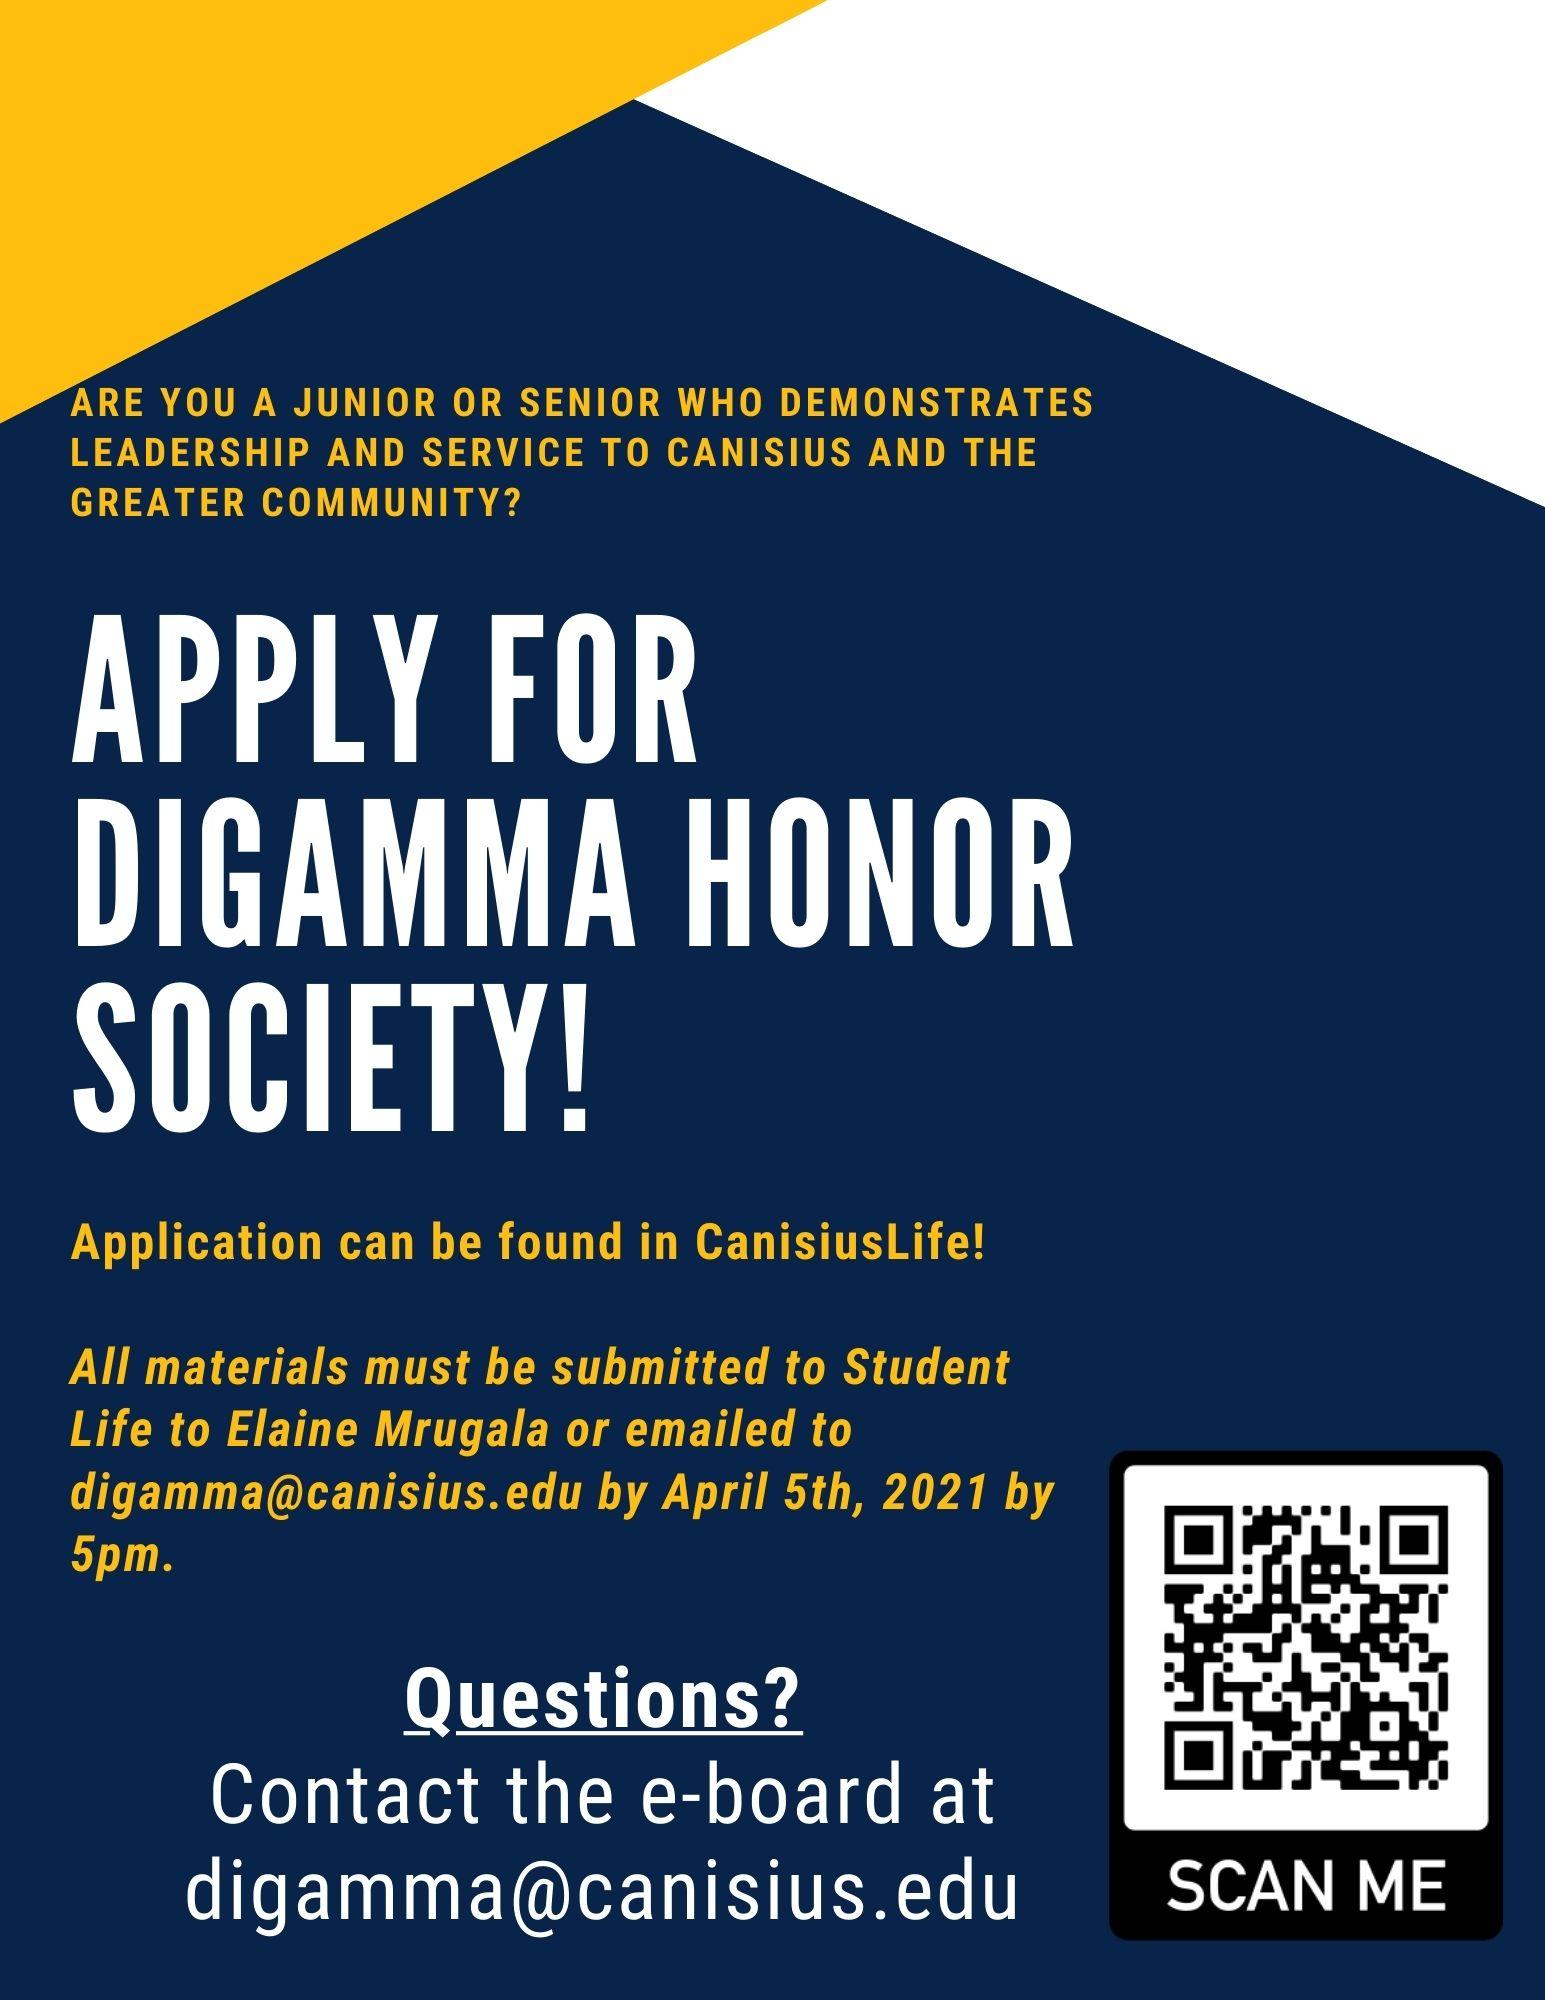 DiGamma Honor Society w_ QR Code.jpg